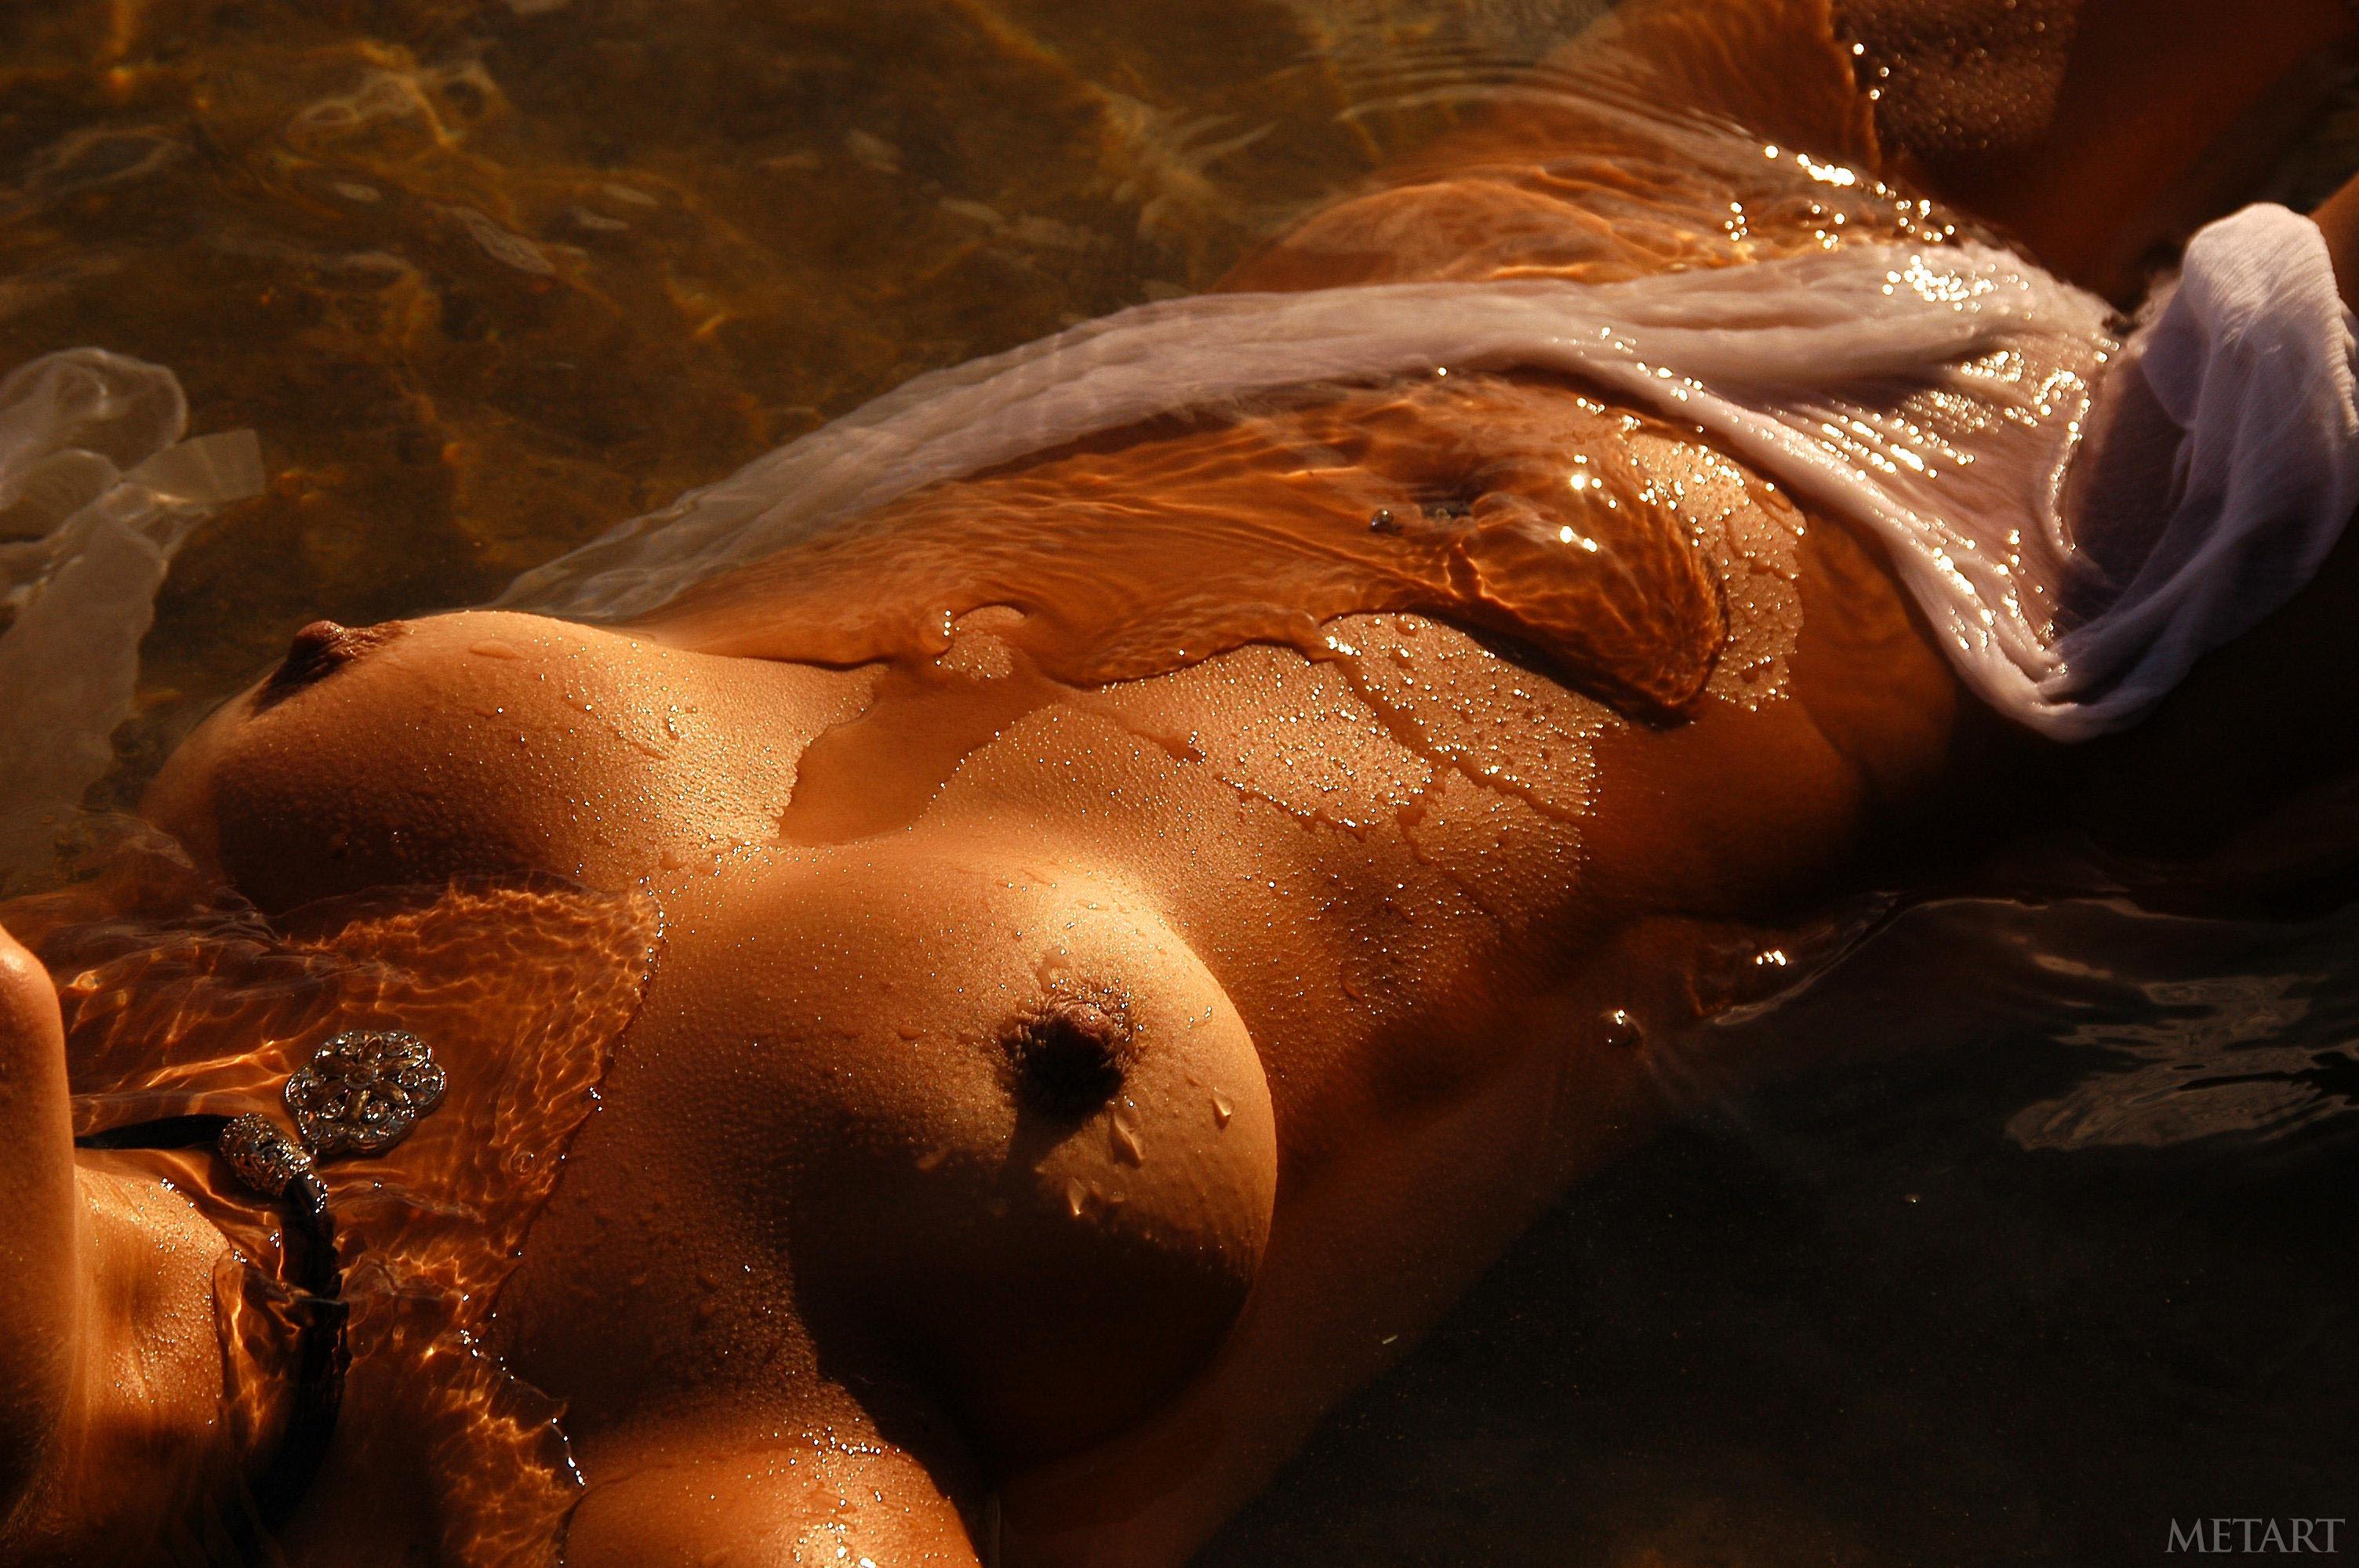 juma-africa-seaside-bikini-metart-22